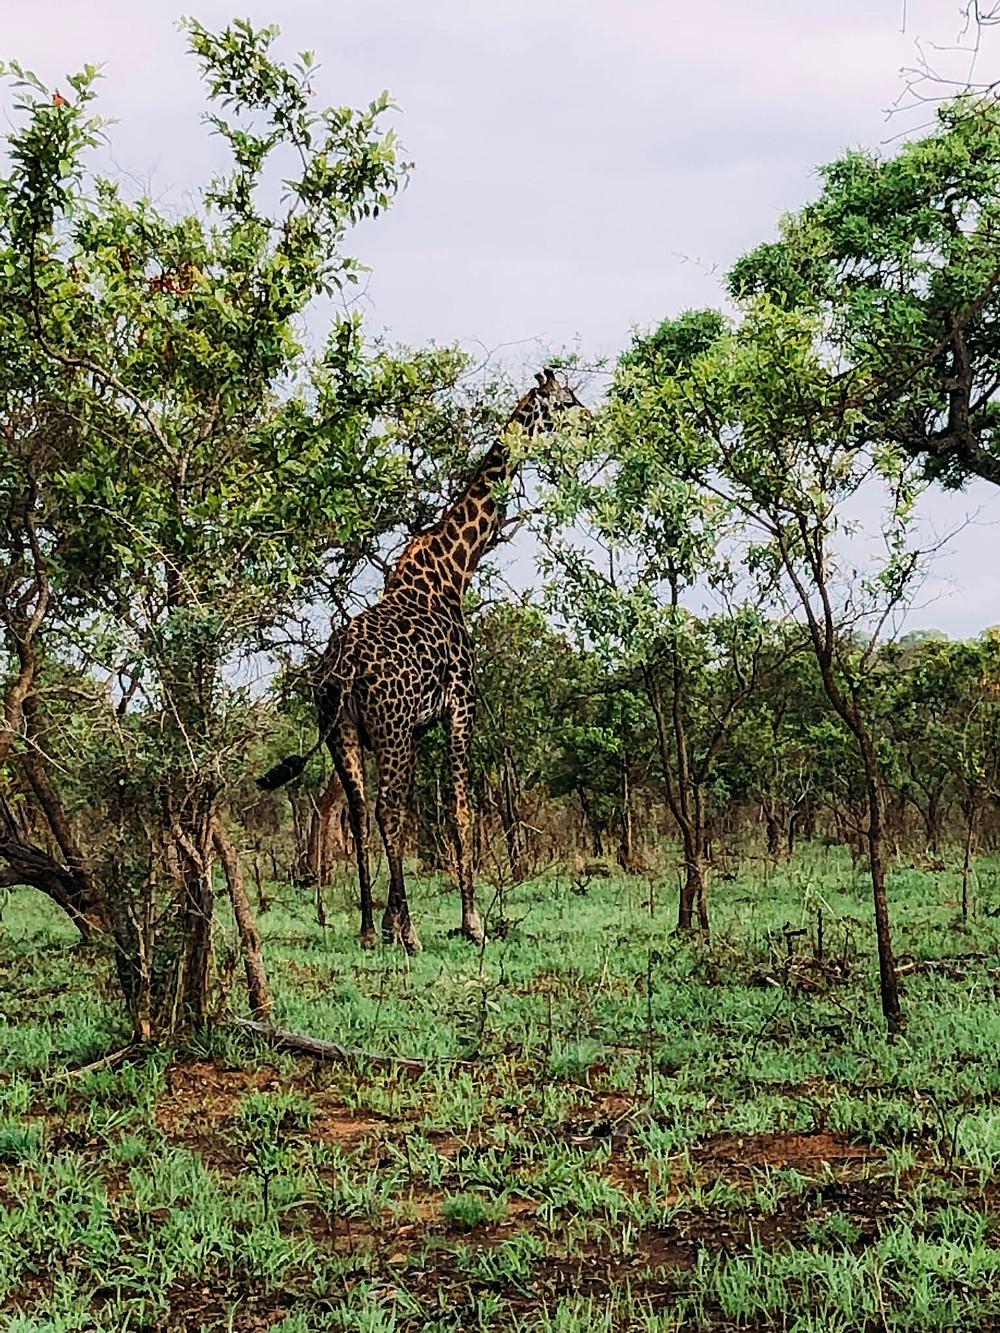 Mr. Giraffe bidding us farewell